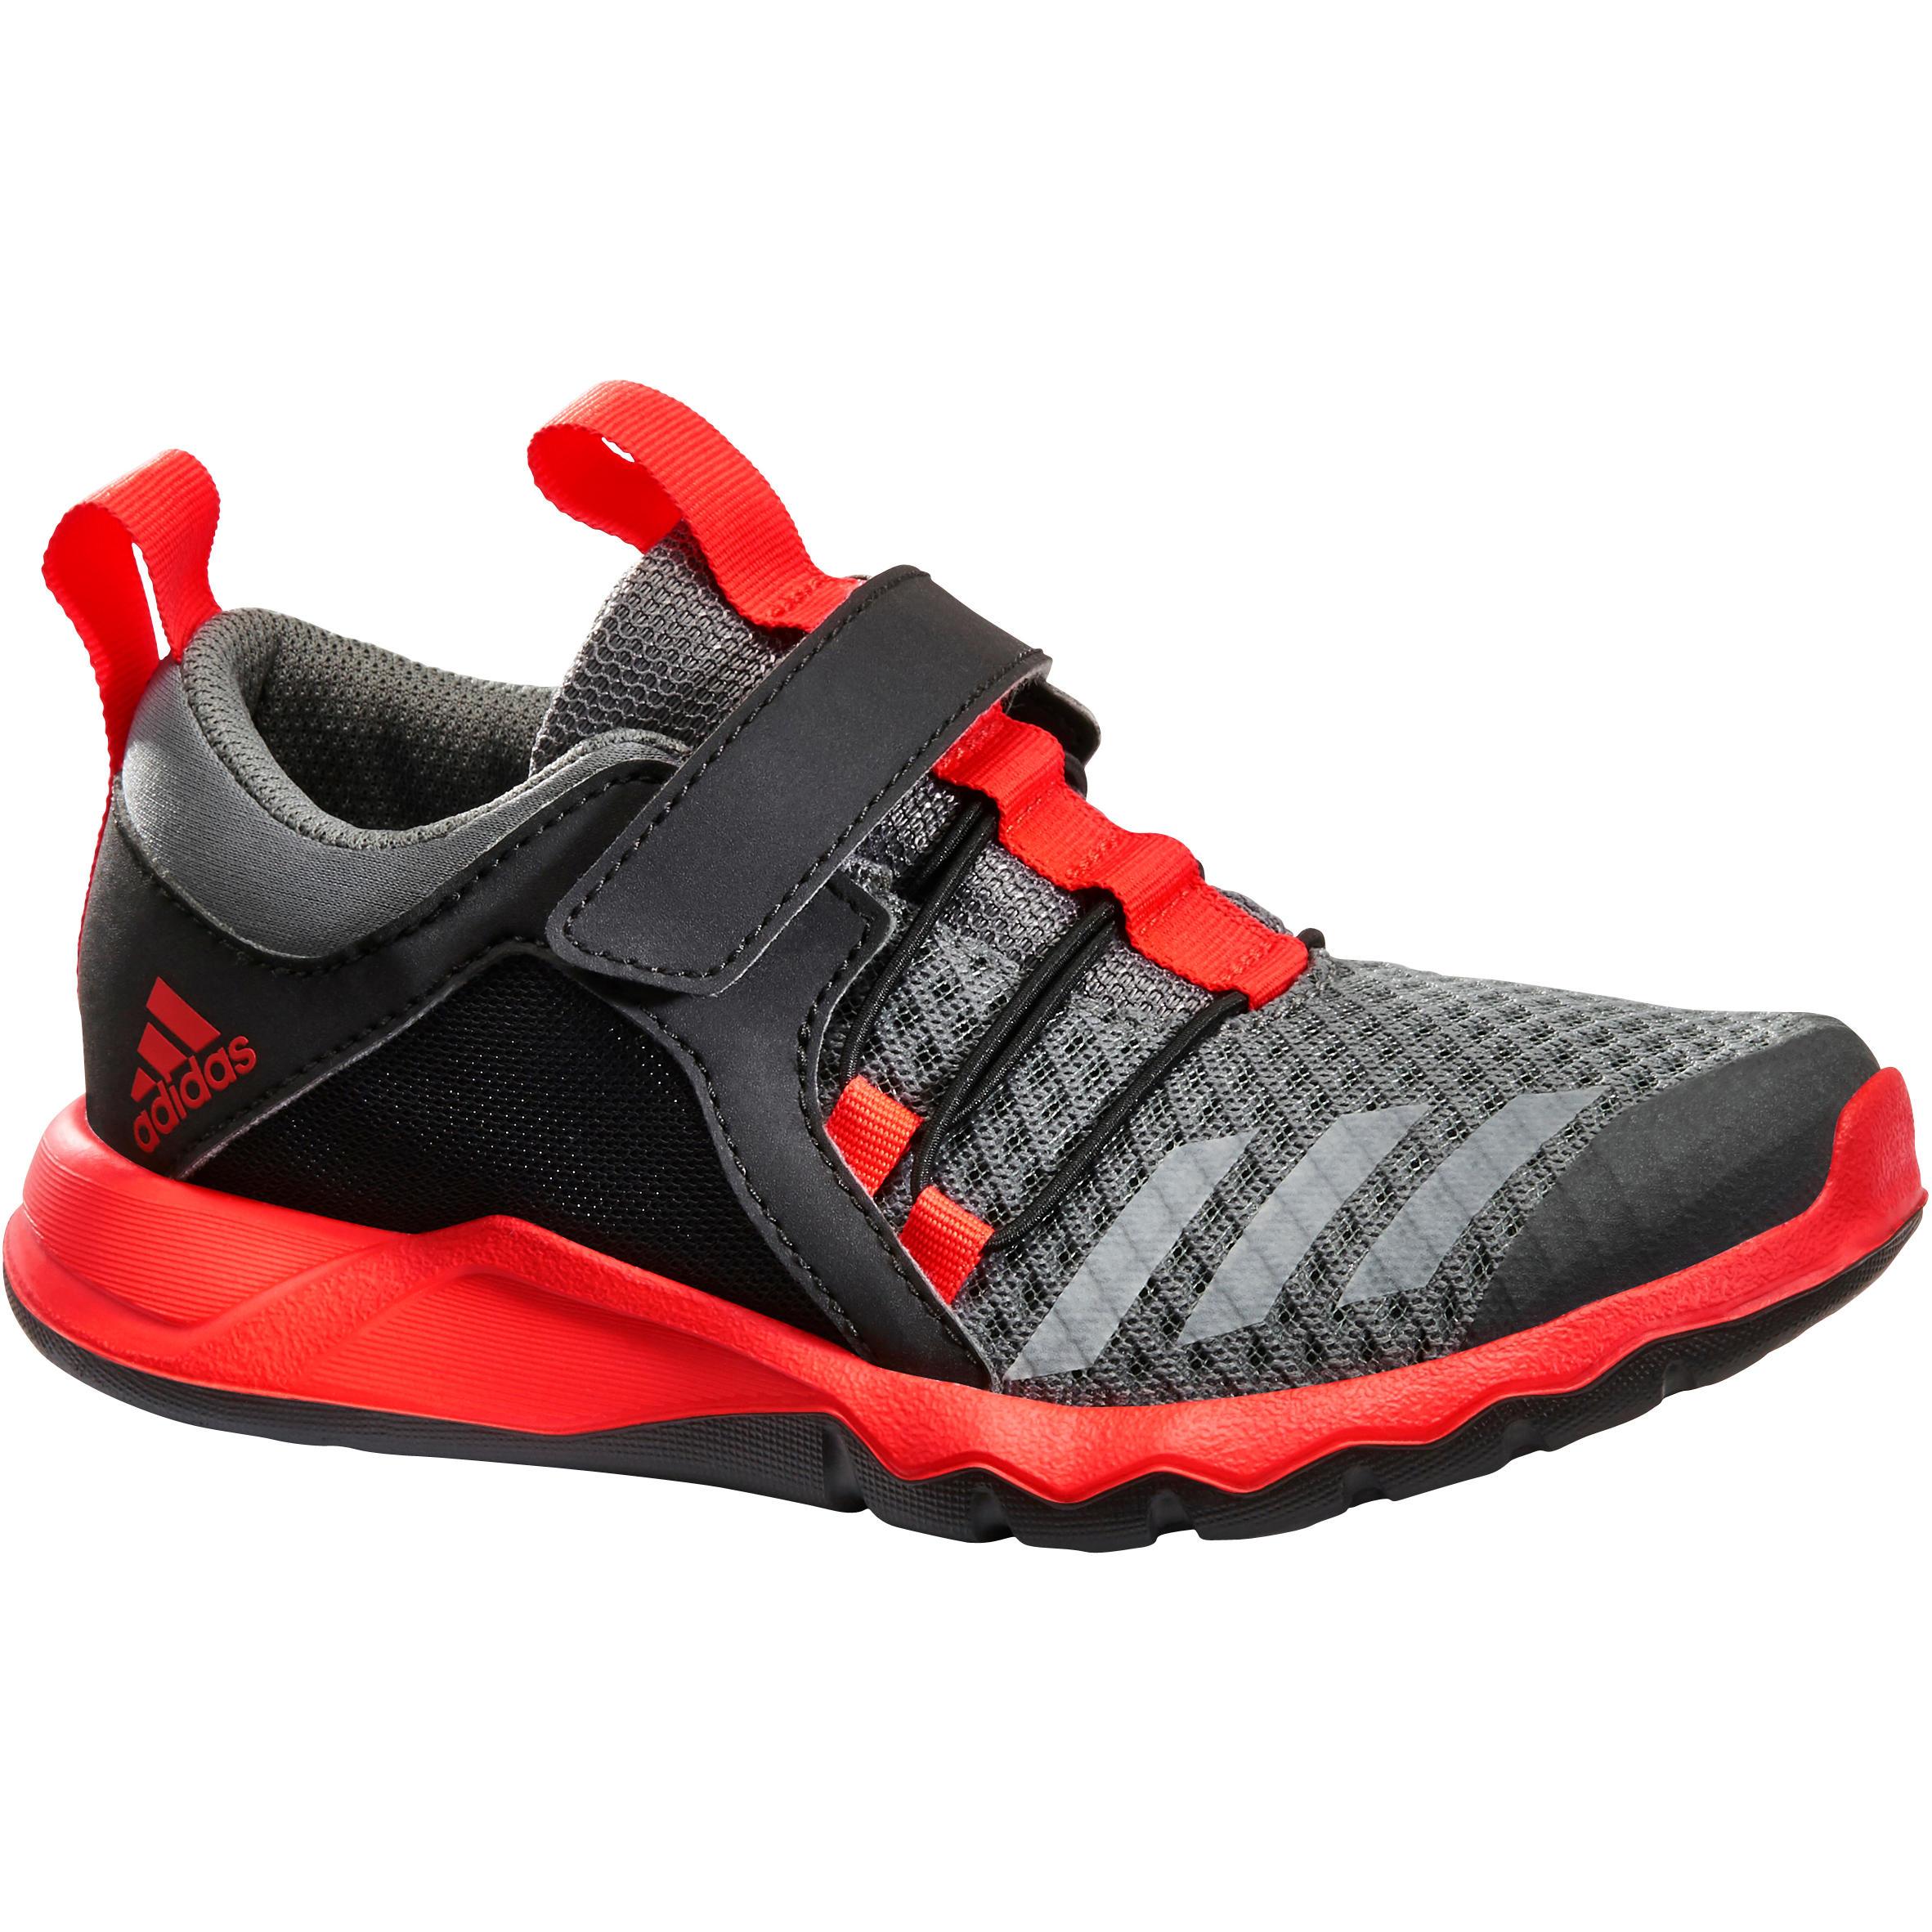 578024ab28c chaussures marche athletique adidas